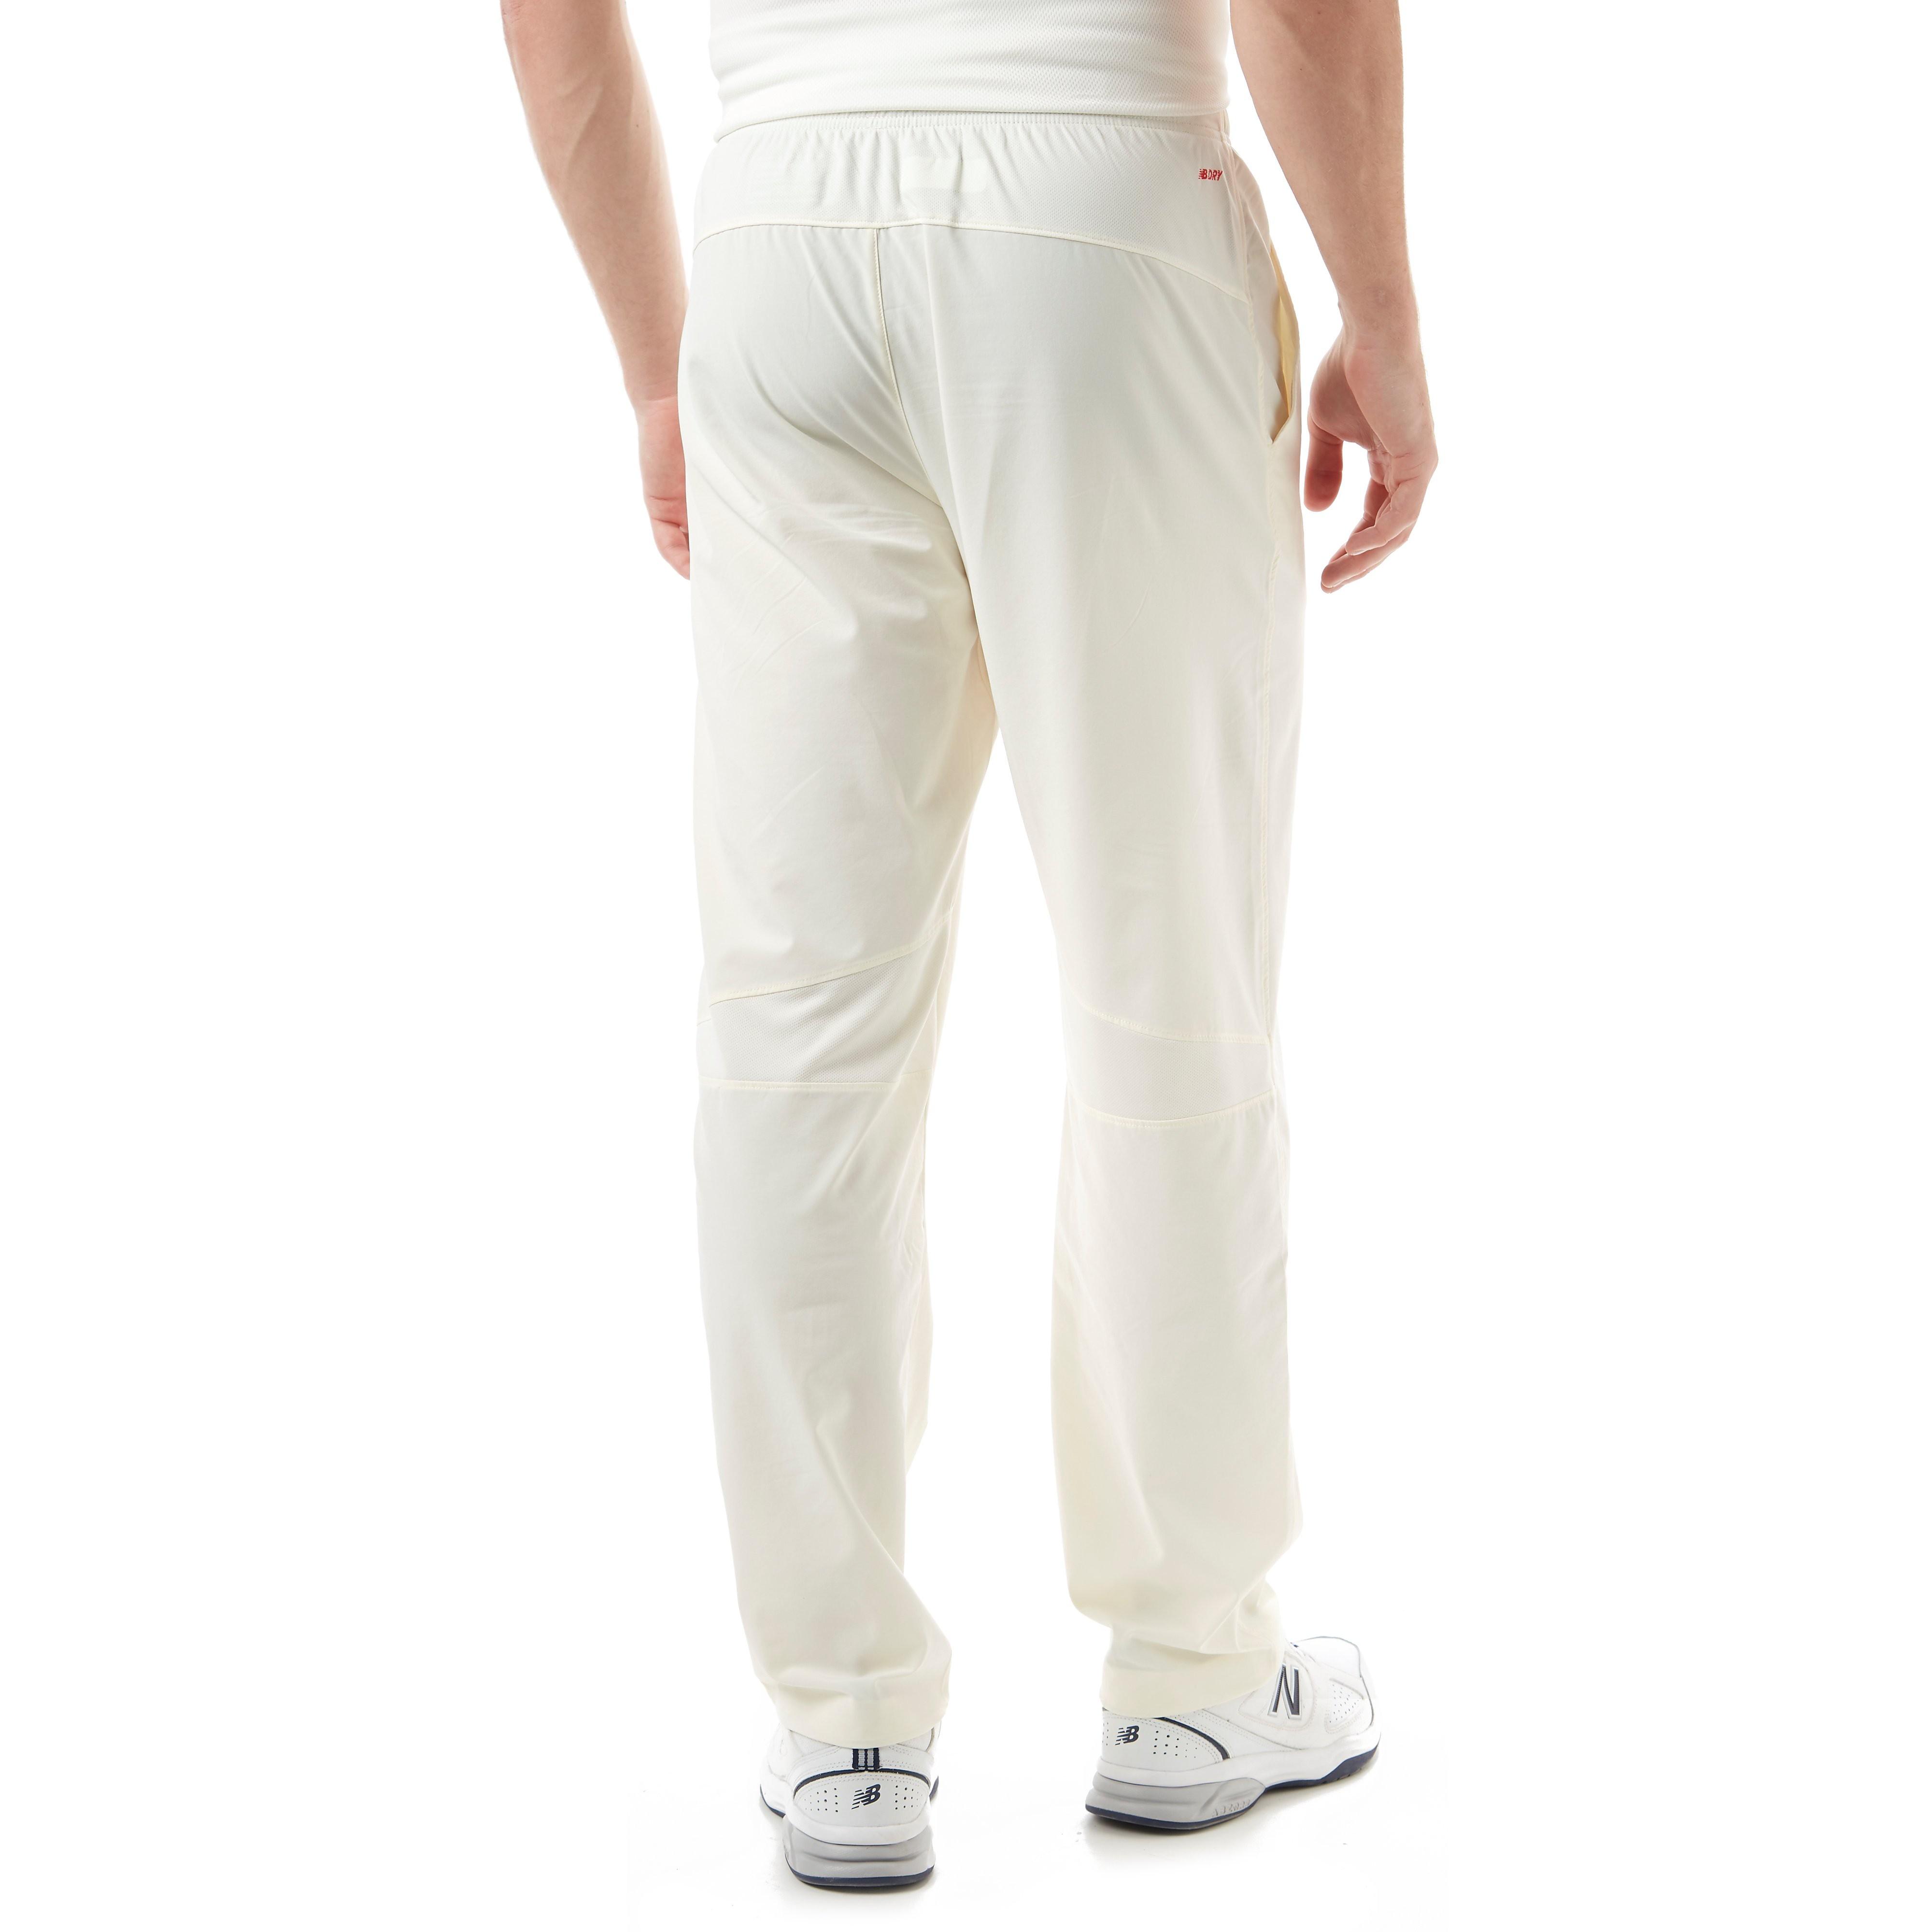 New Balance Men's Cricket Pants